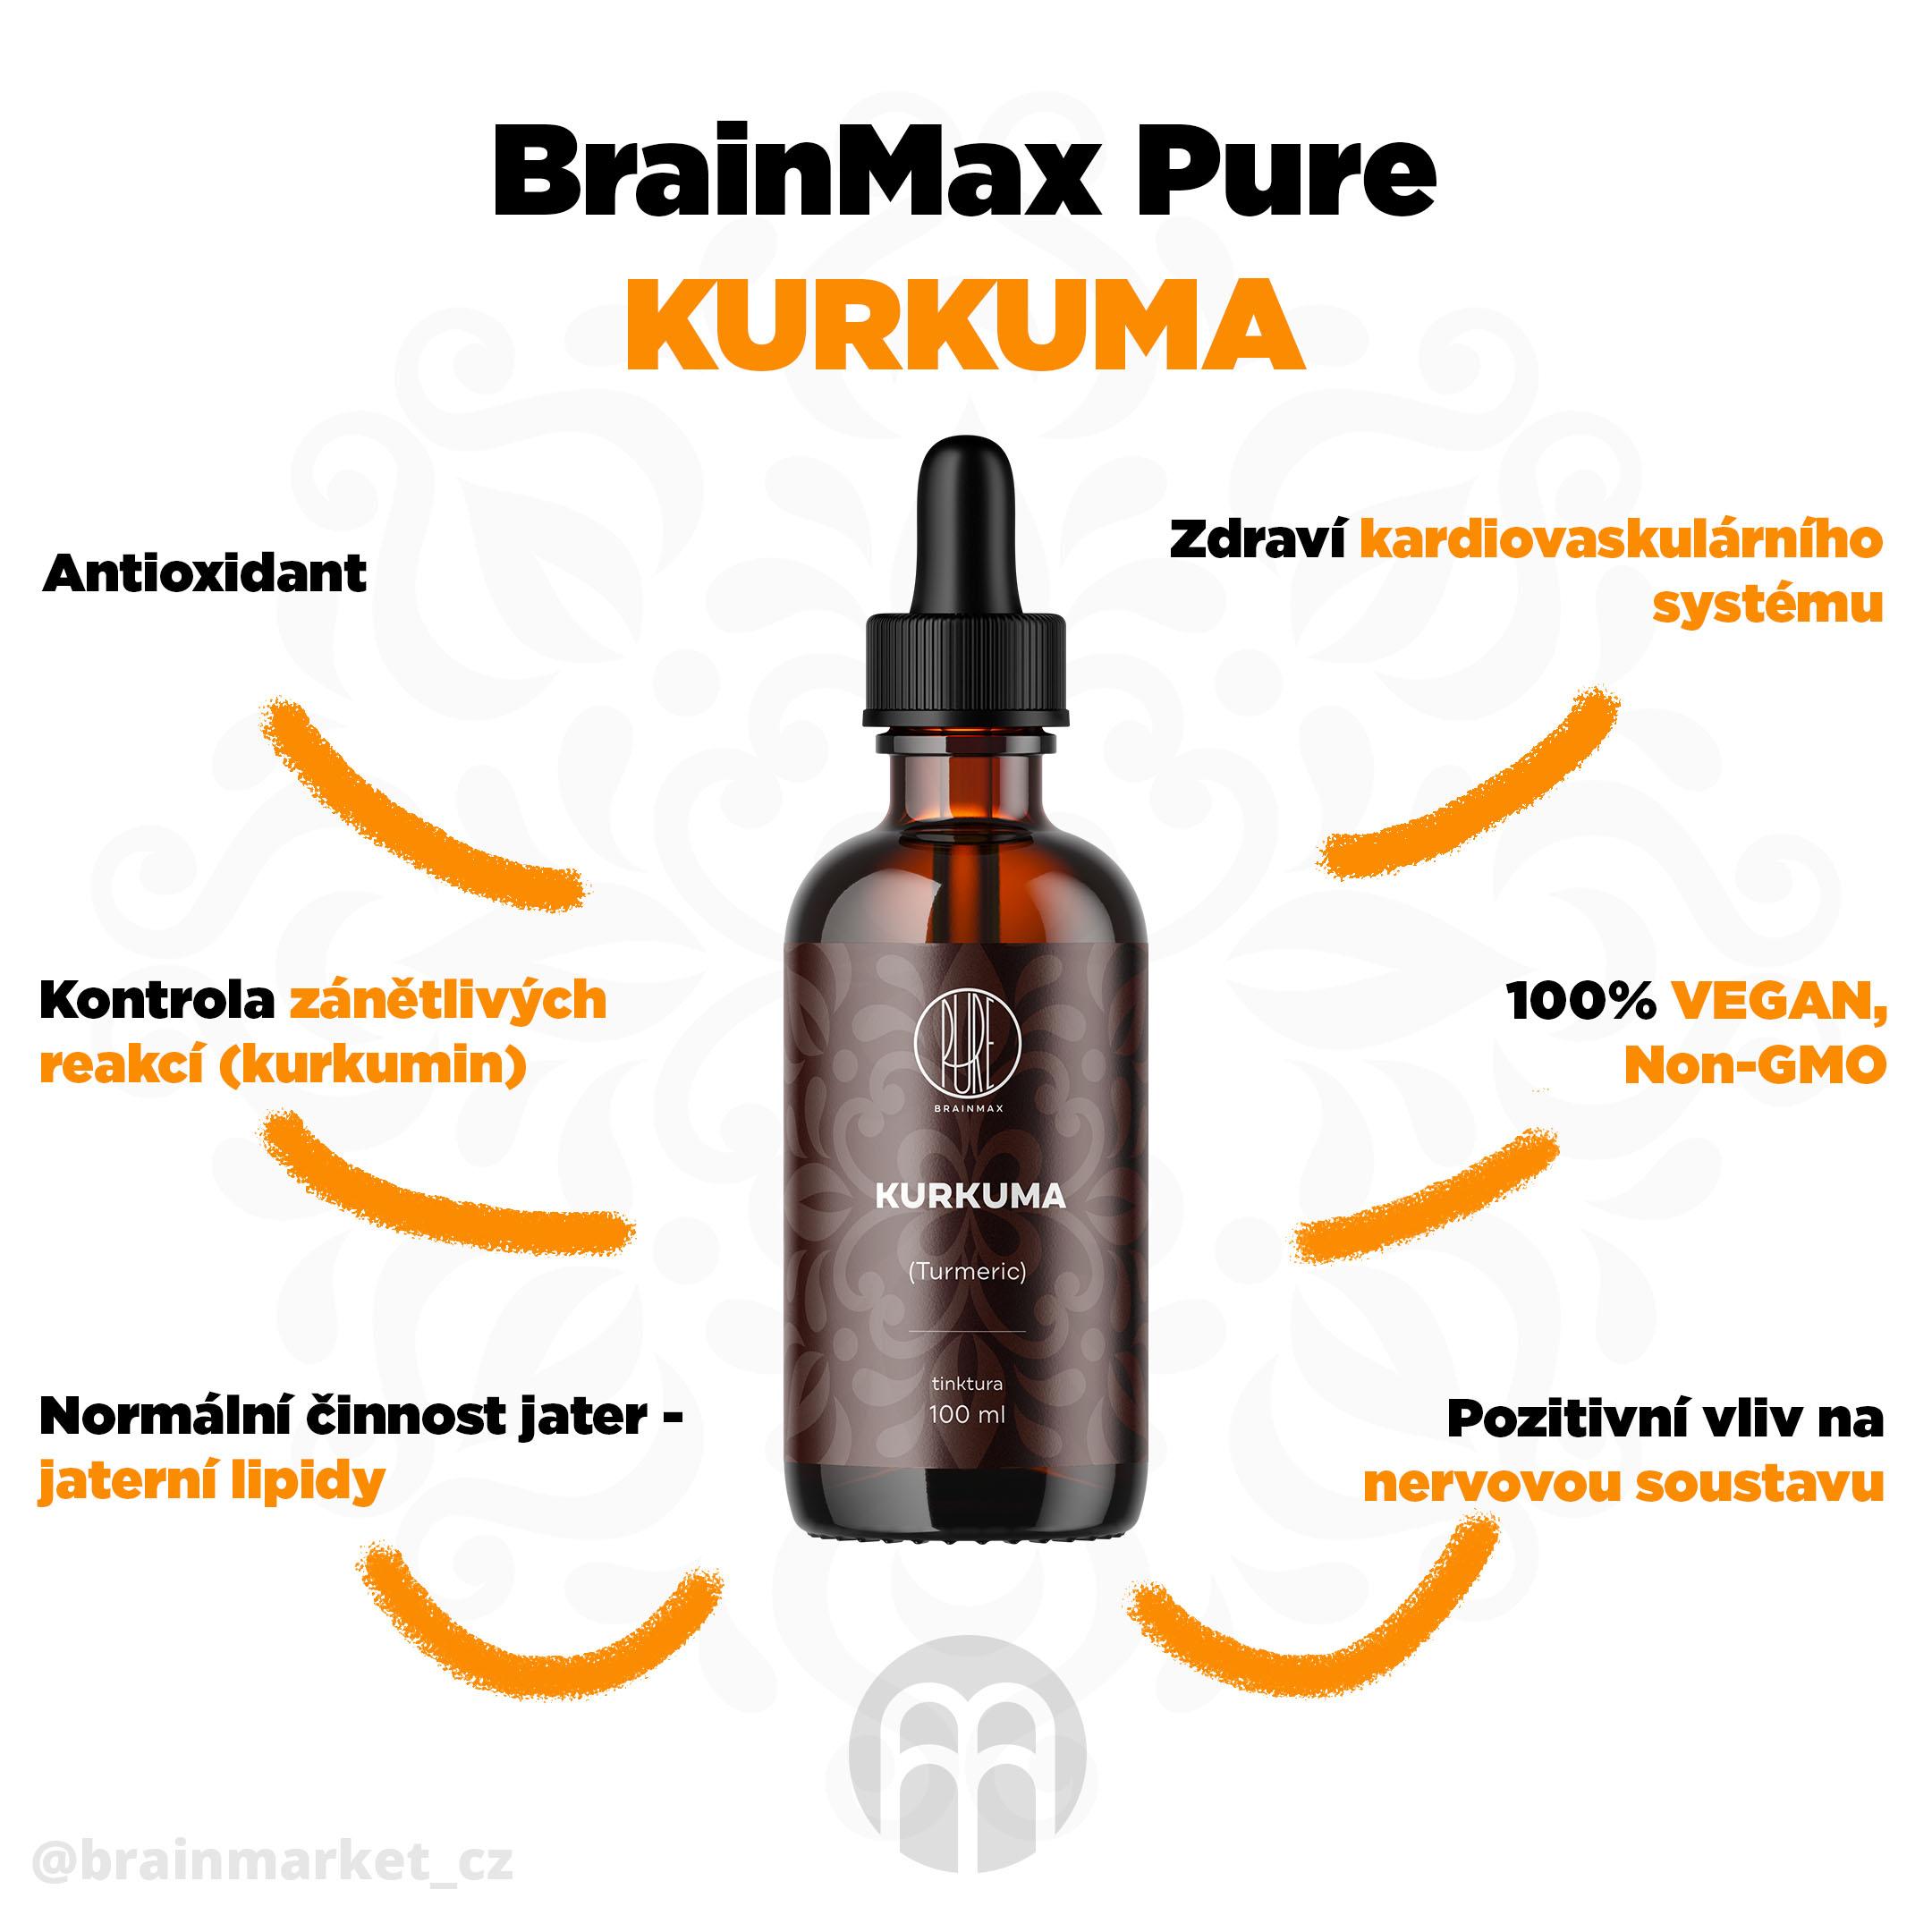 kurkuma_infografika_brainmarket_cz